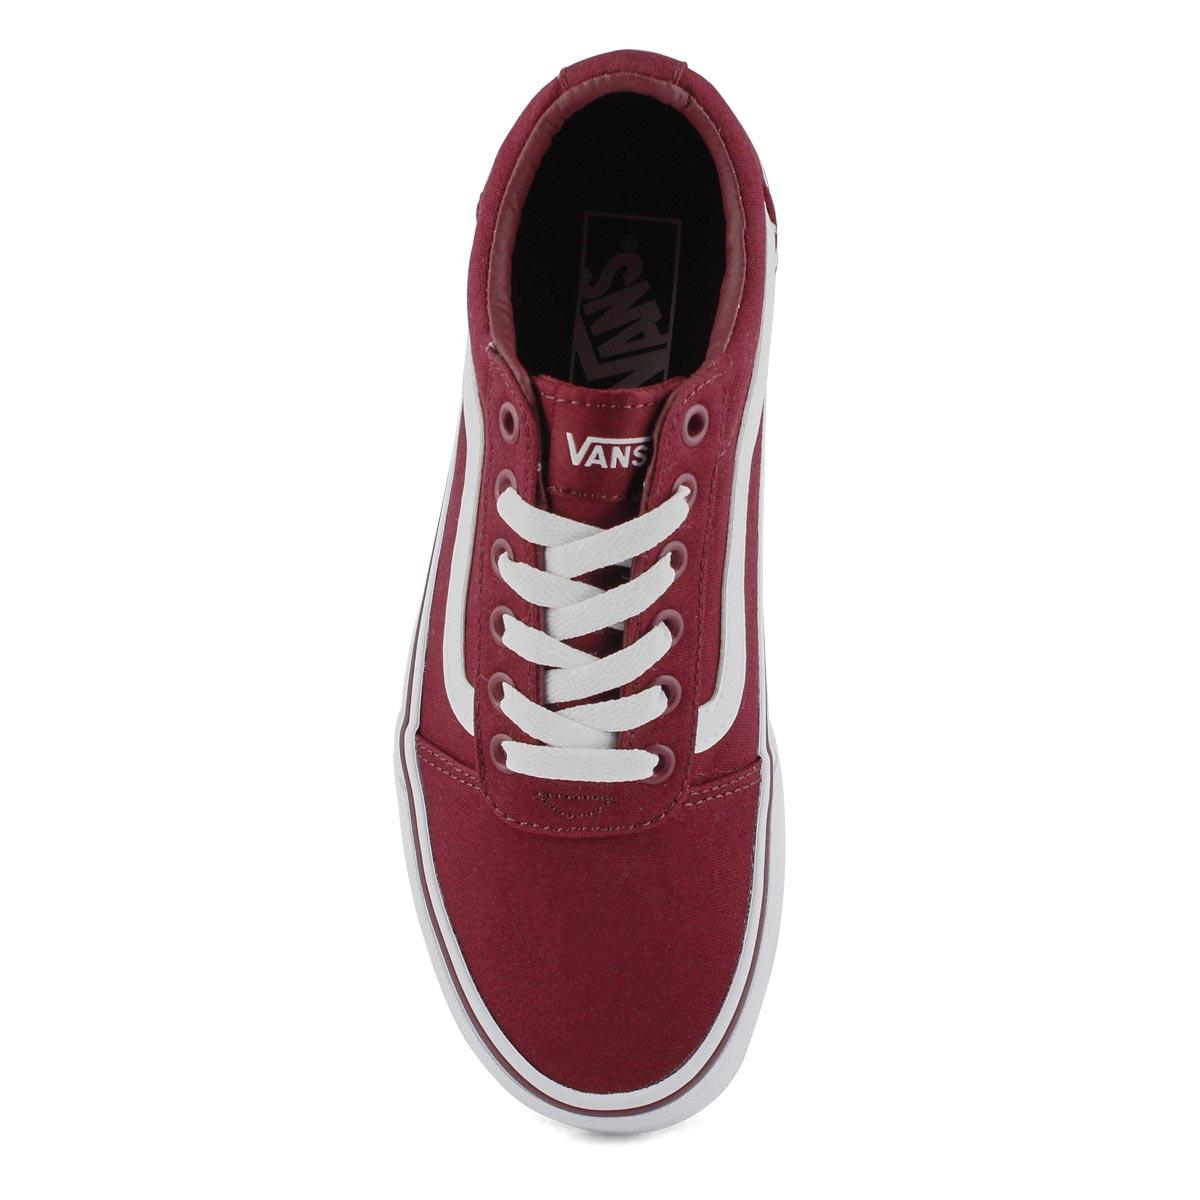 Women's Ward Sneaker - Burgundy/White